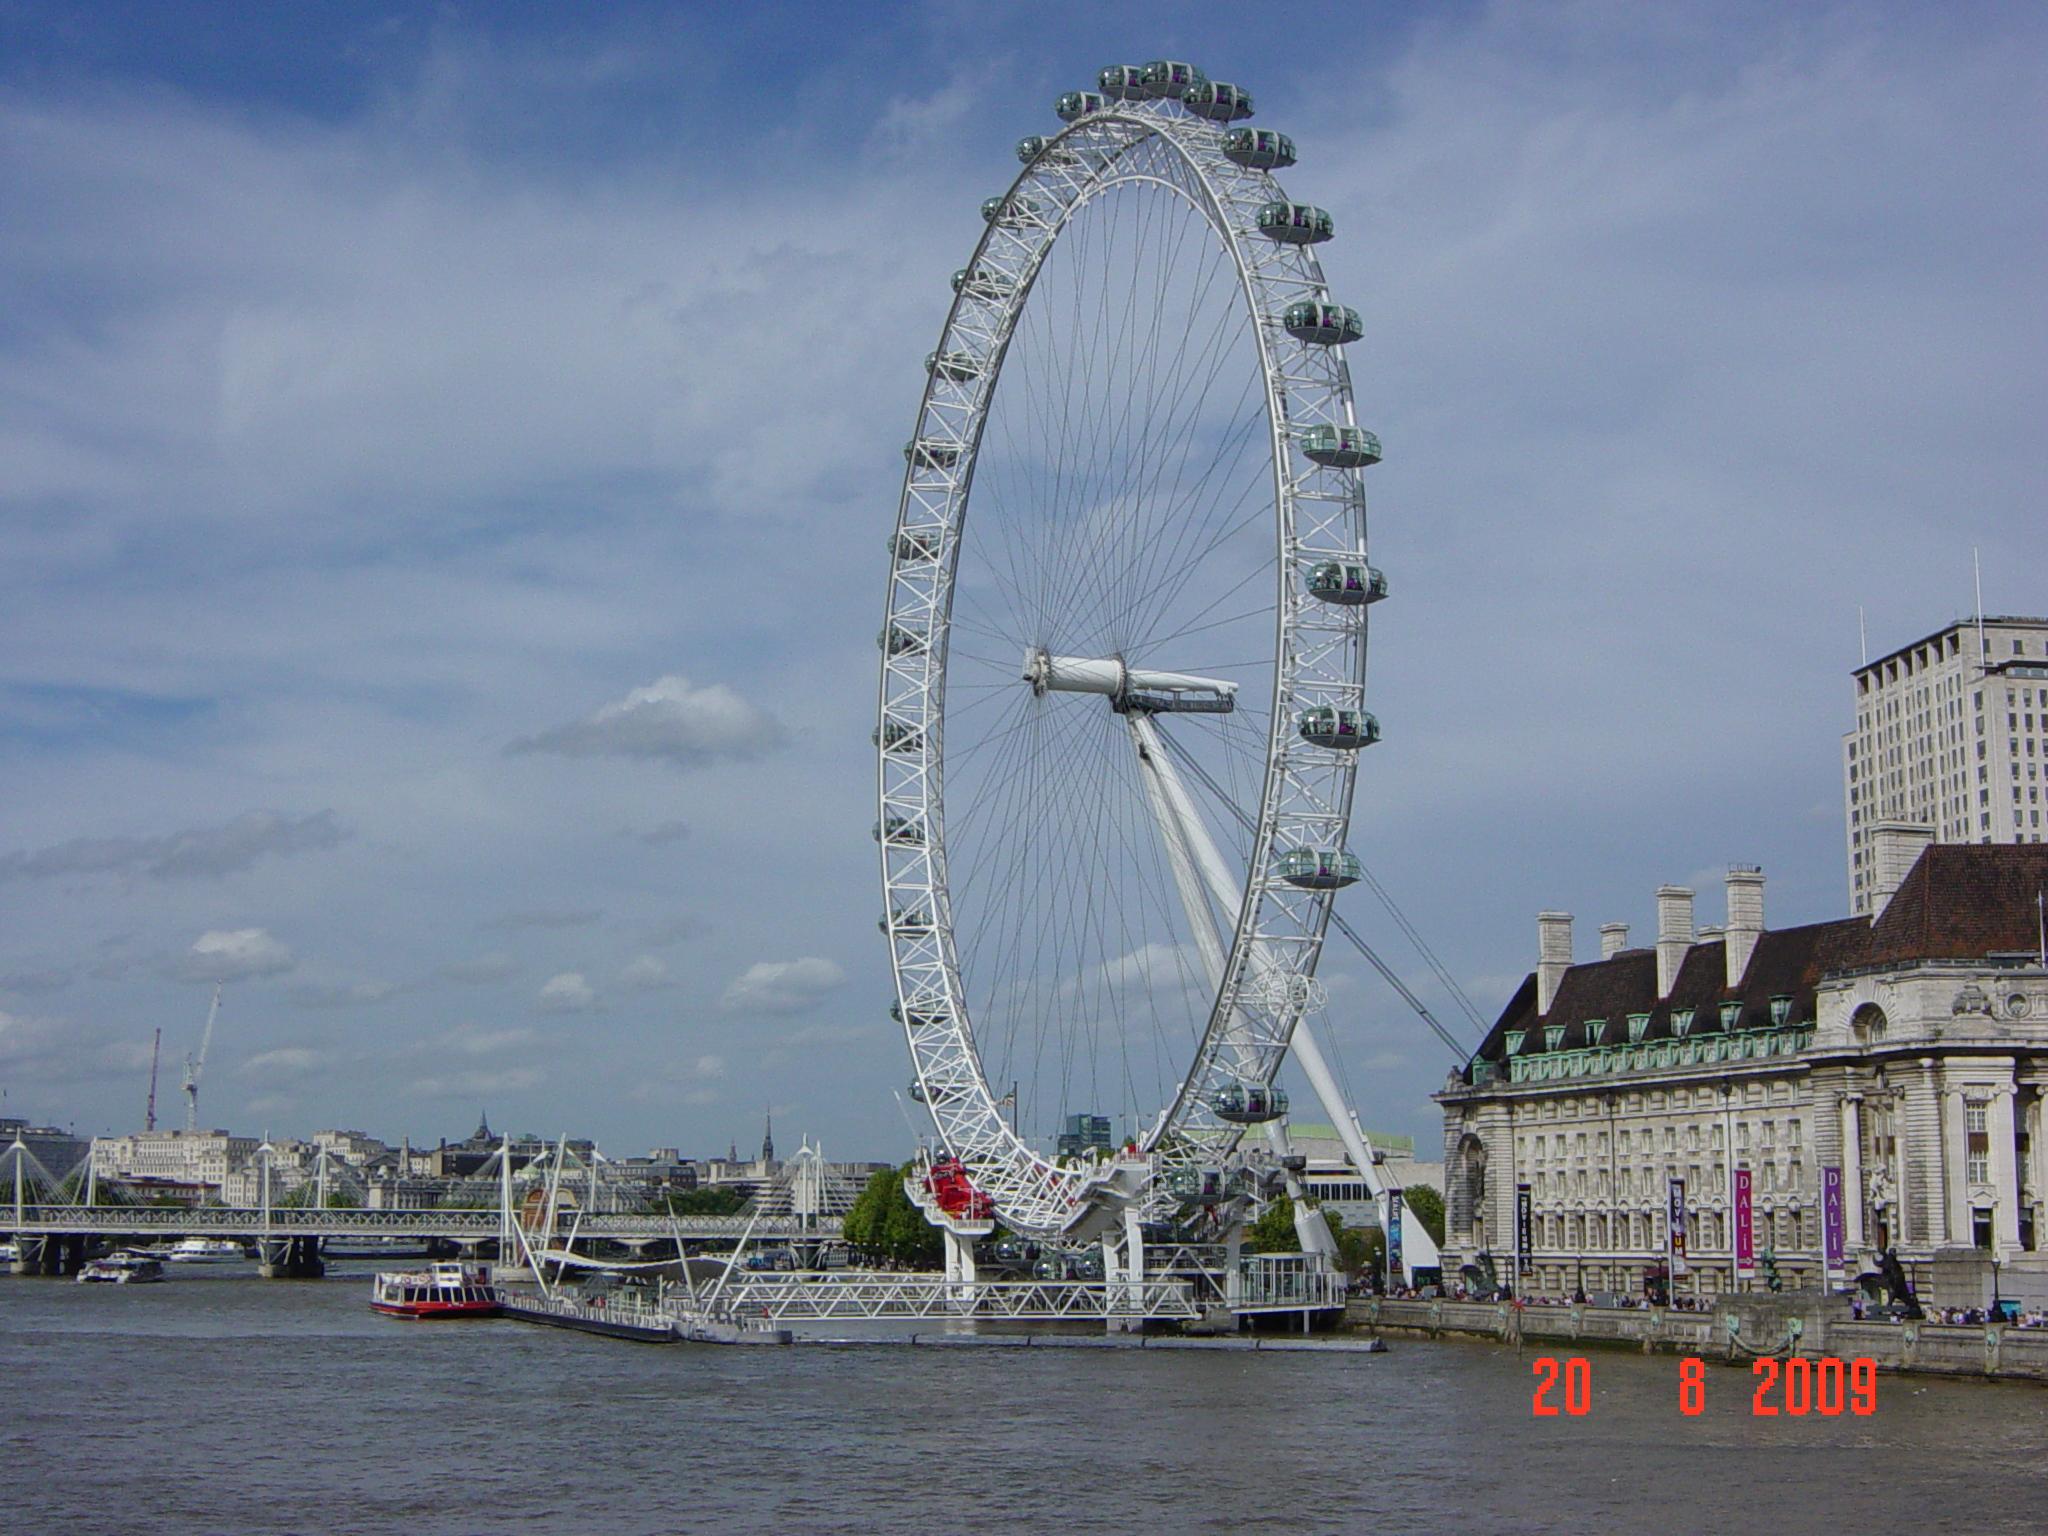 File London Eye Panoramio 20 Jpg Wikimedia Commons Images, Photos, Reviews